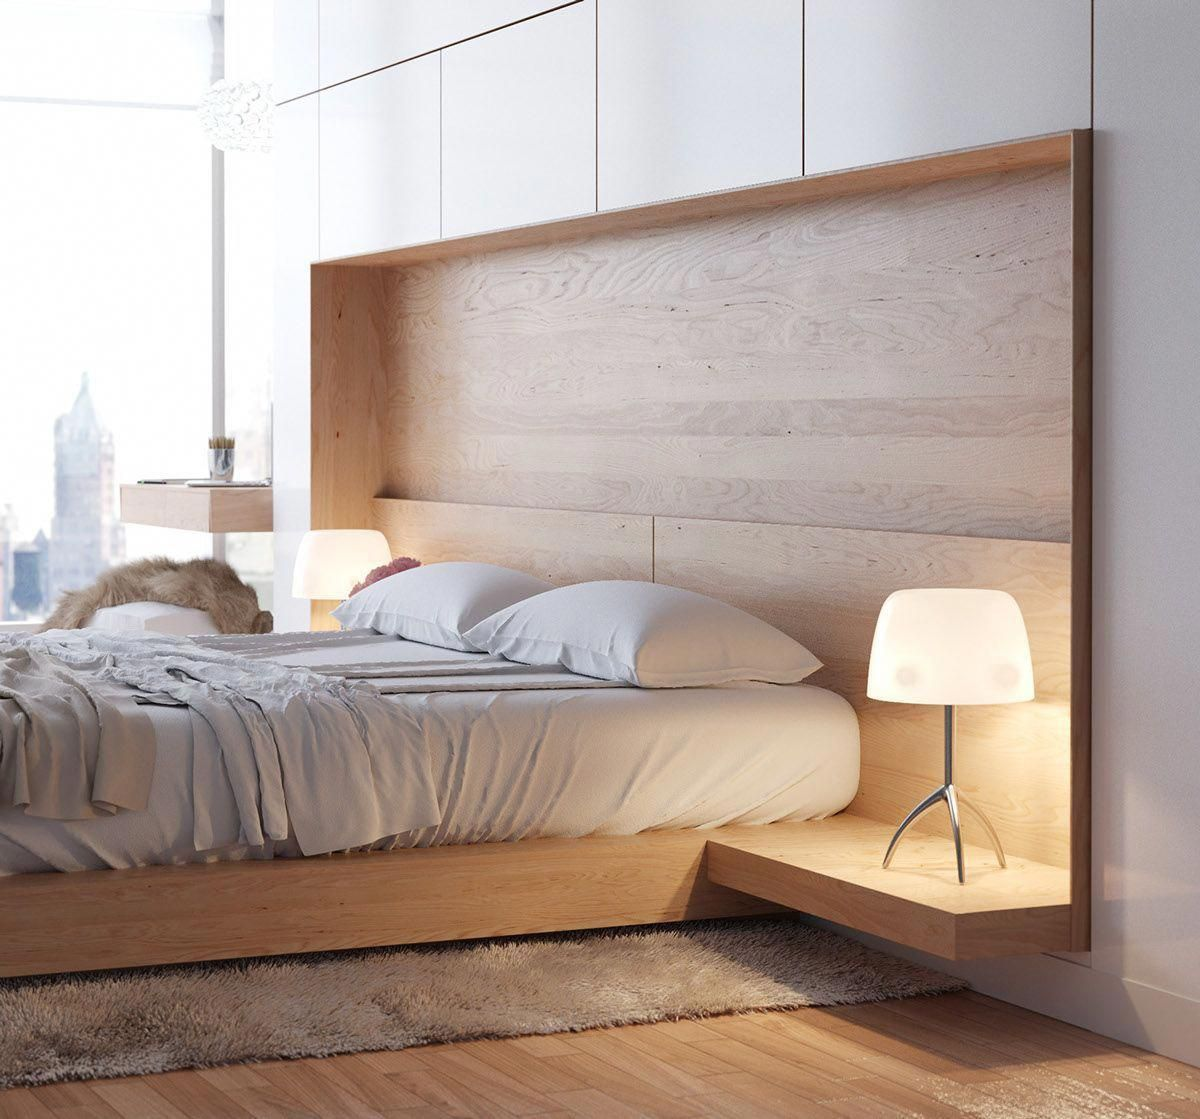 Best Bedroom Furniture Sets King Near Me In 2019 Modern 400 x 300